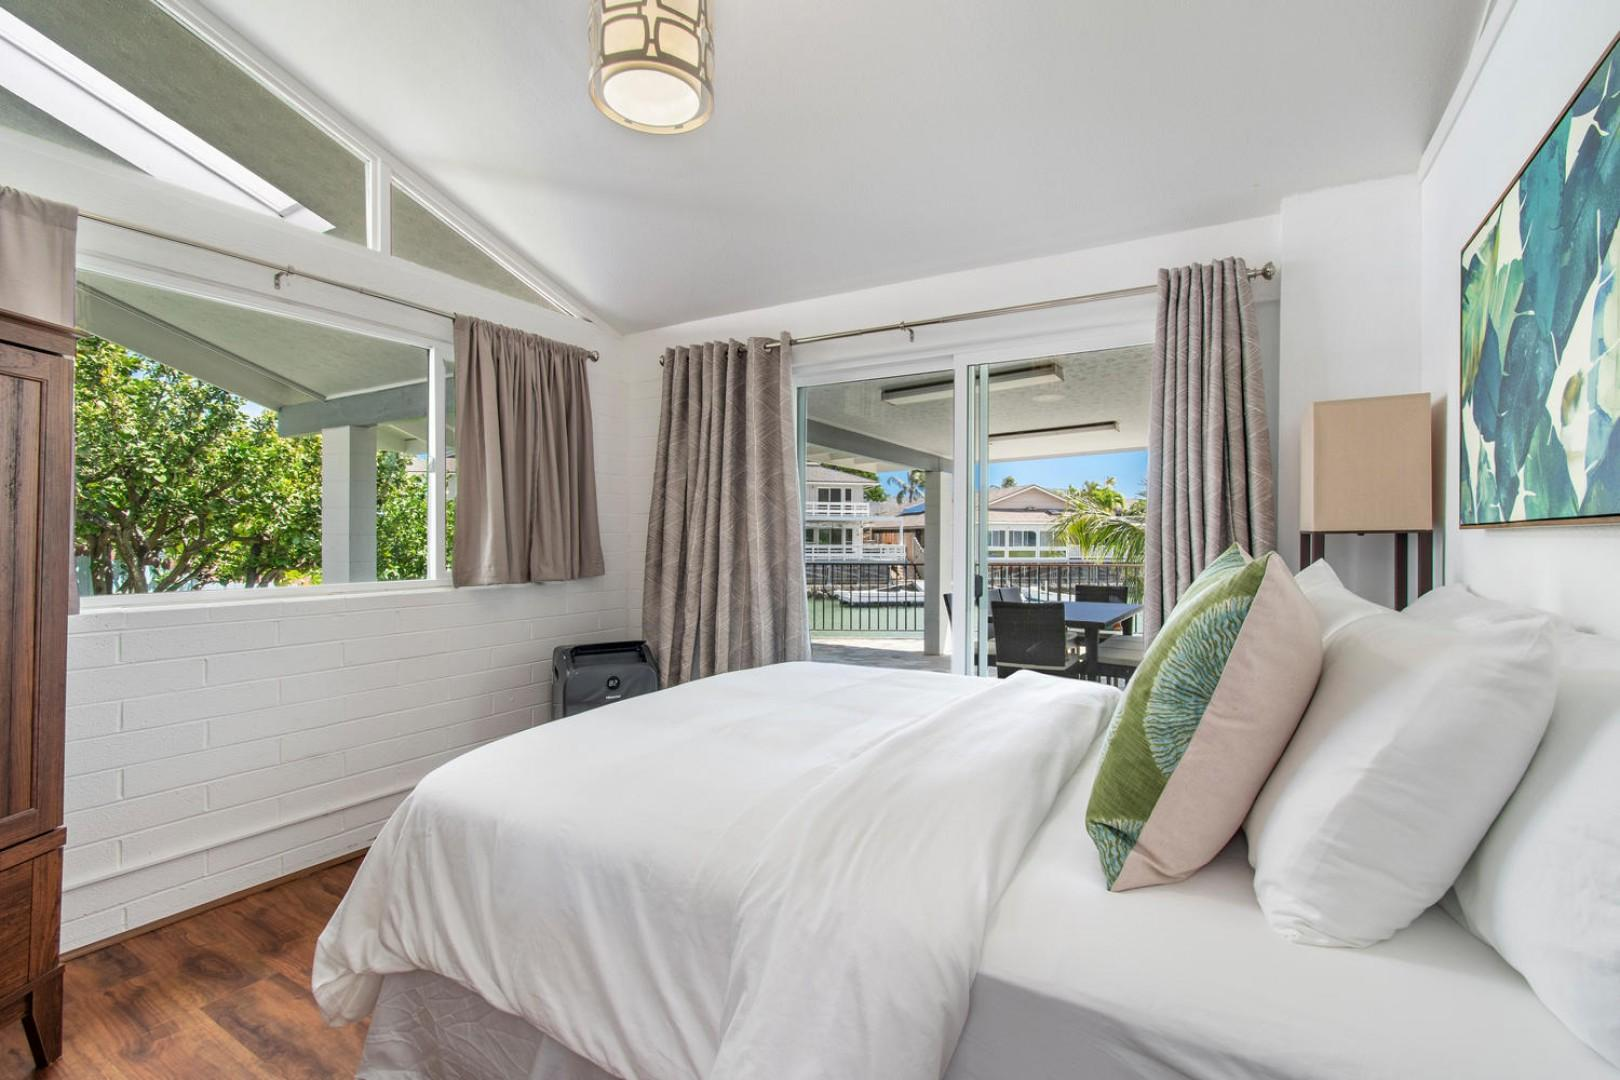 Bedroom 4 - Queen bed, standing ac with marina views.